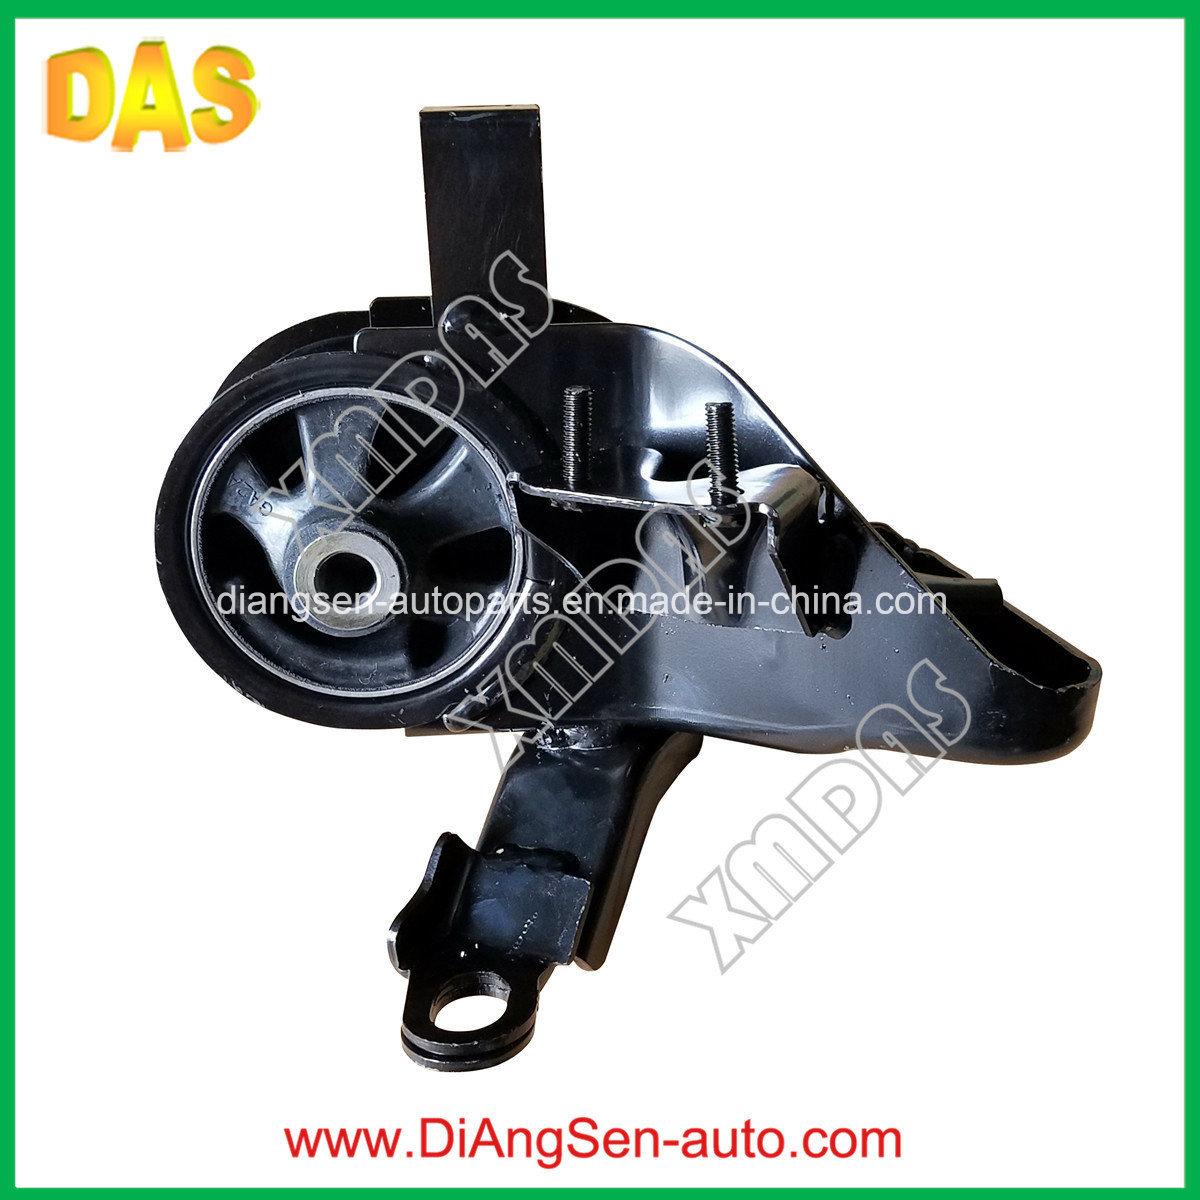 China Auto Parts Transmission Engine Mounts for Mazda Car (GA2A-39 ...